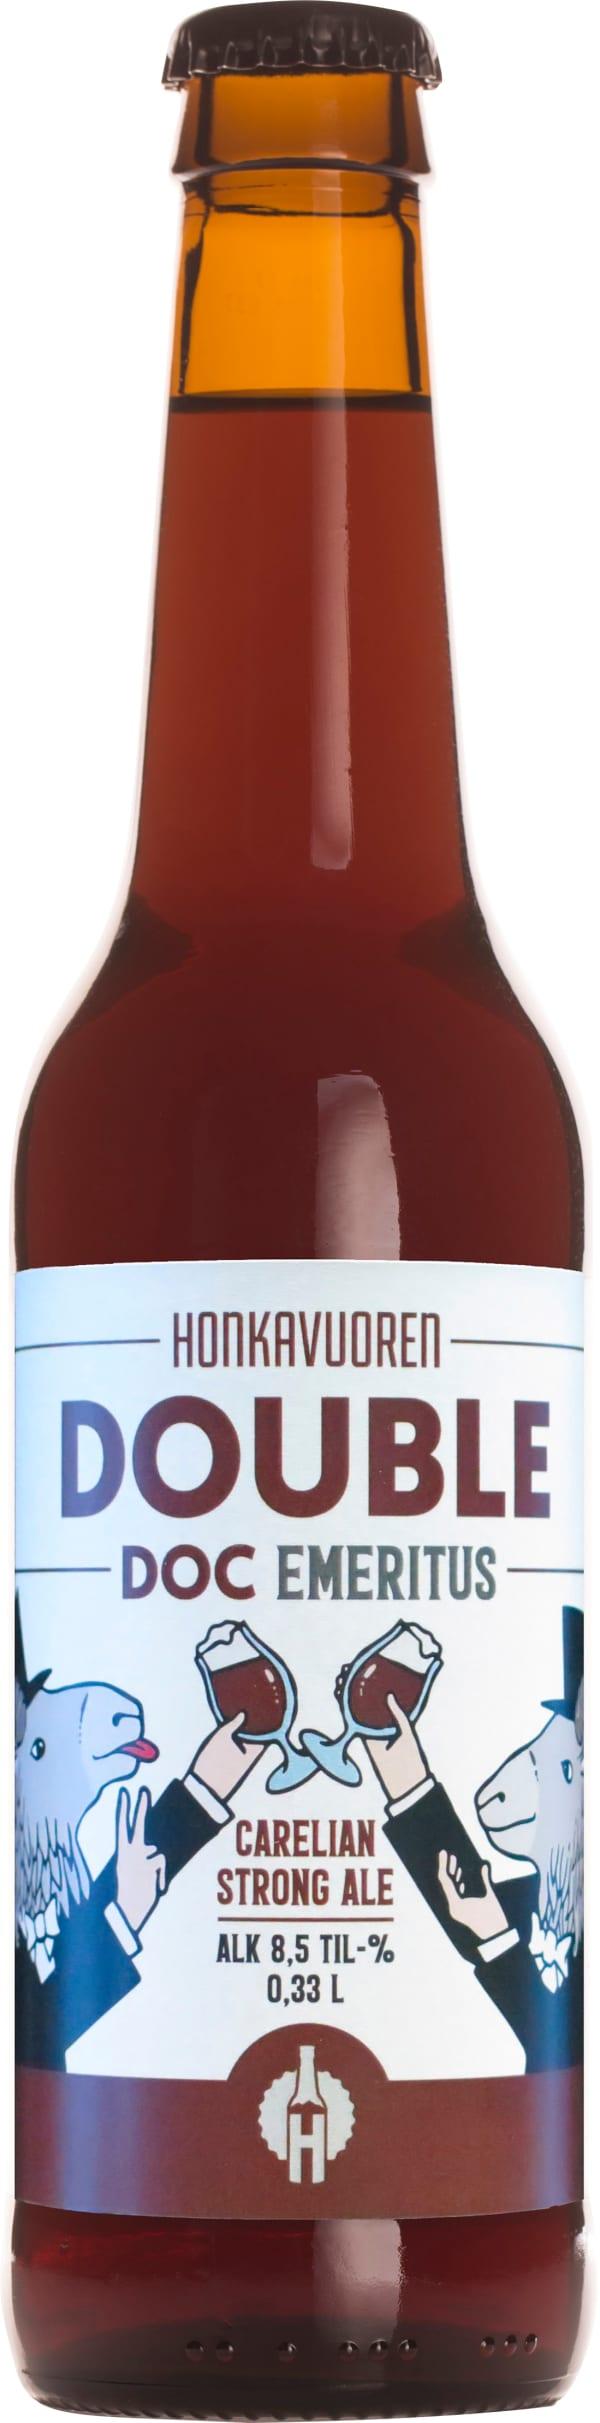 Honkavuoren Double Doc Emeritus